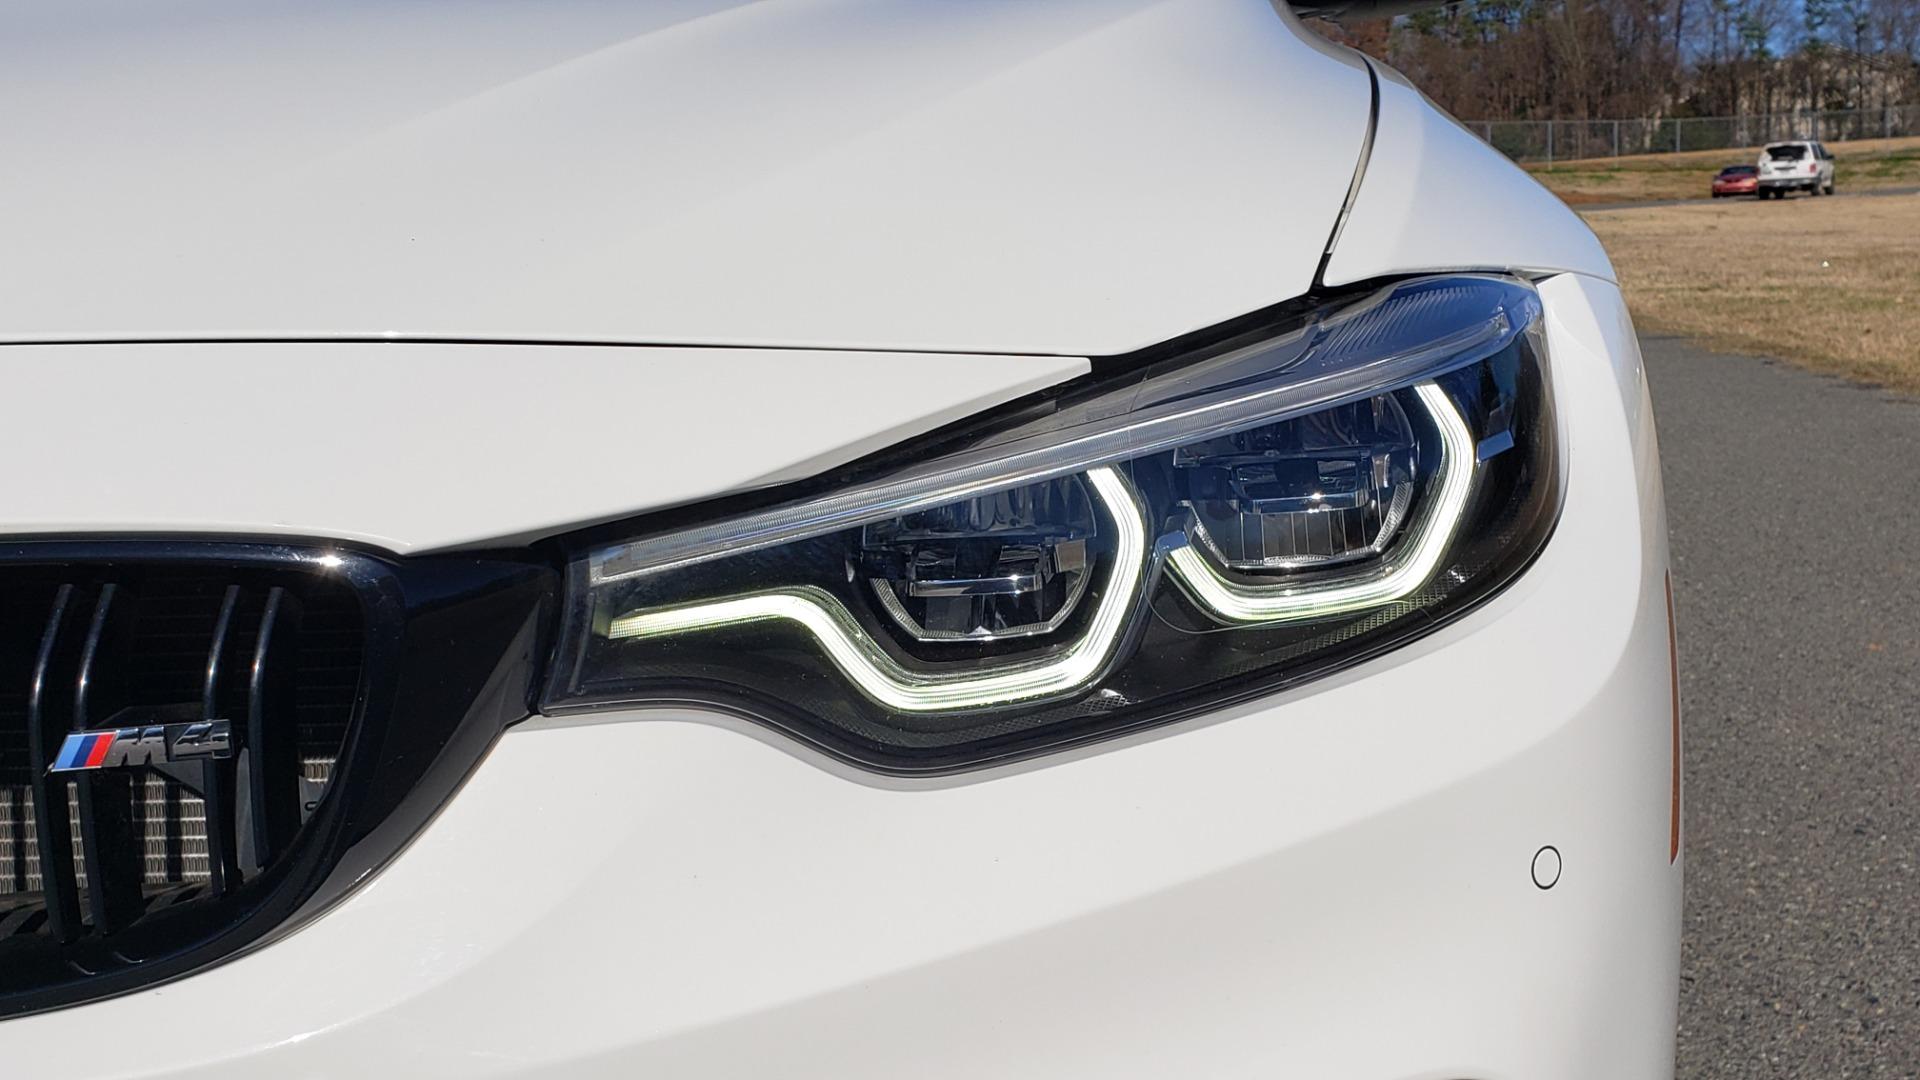 Used 2018 BMW M4 COMP PKG / EXEC / M-DRIVER / PARK CNTRL / ACTIVE BLIND SPOT for sale Sold at Formula Imports in Charlotte NC 28227 14